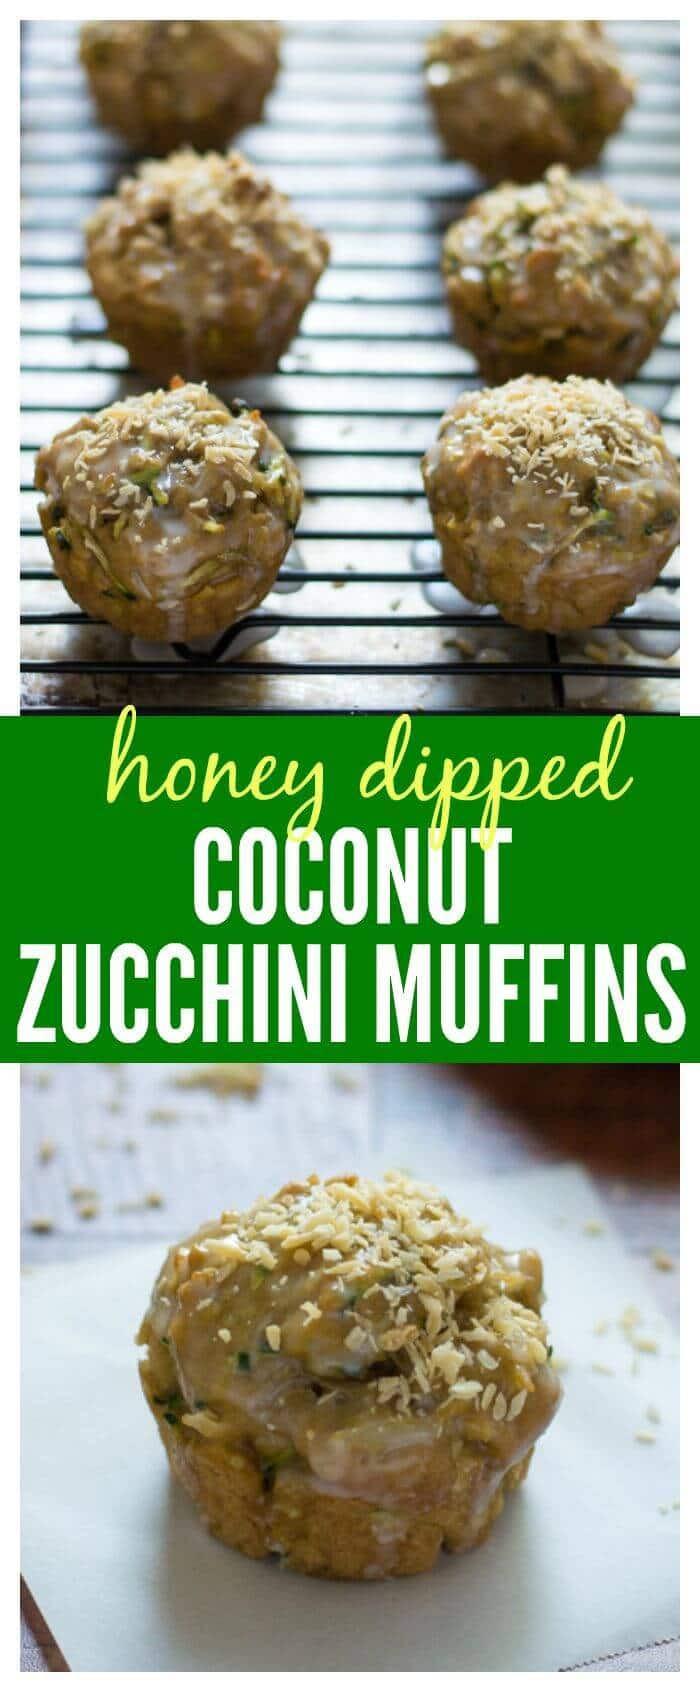 Zucchini Muffins Healthy  Coconut Zucchini Muffins